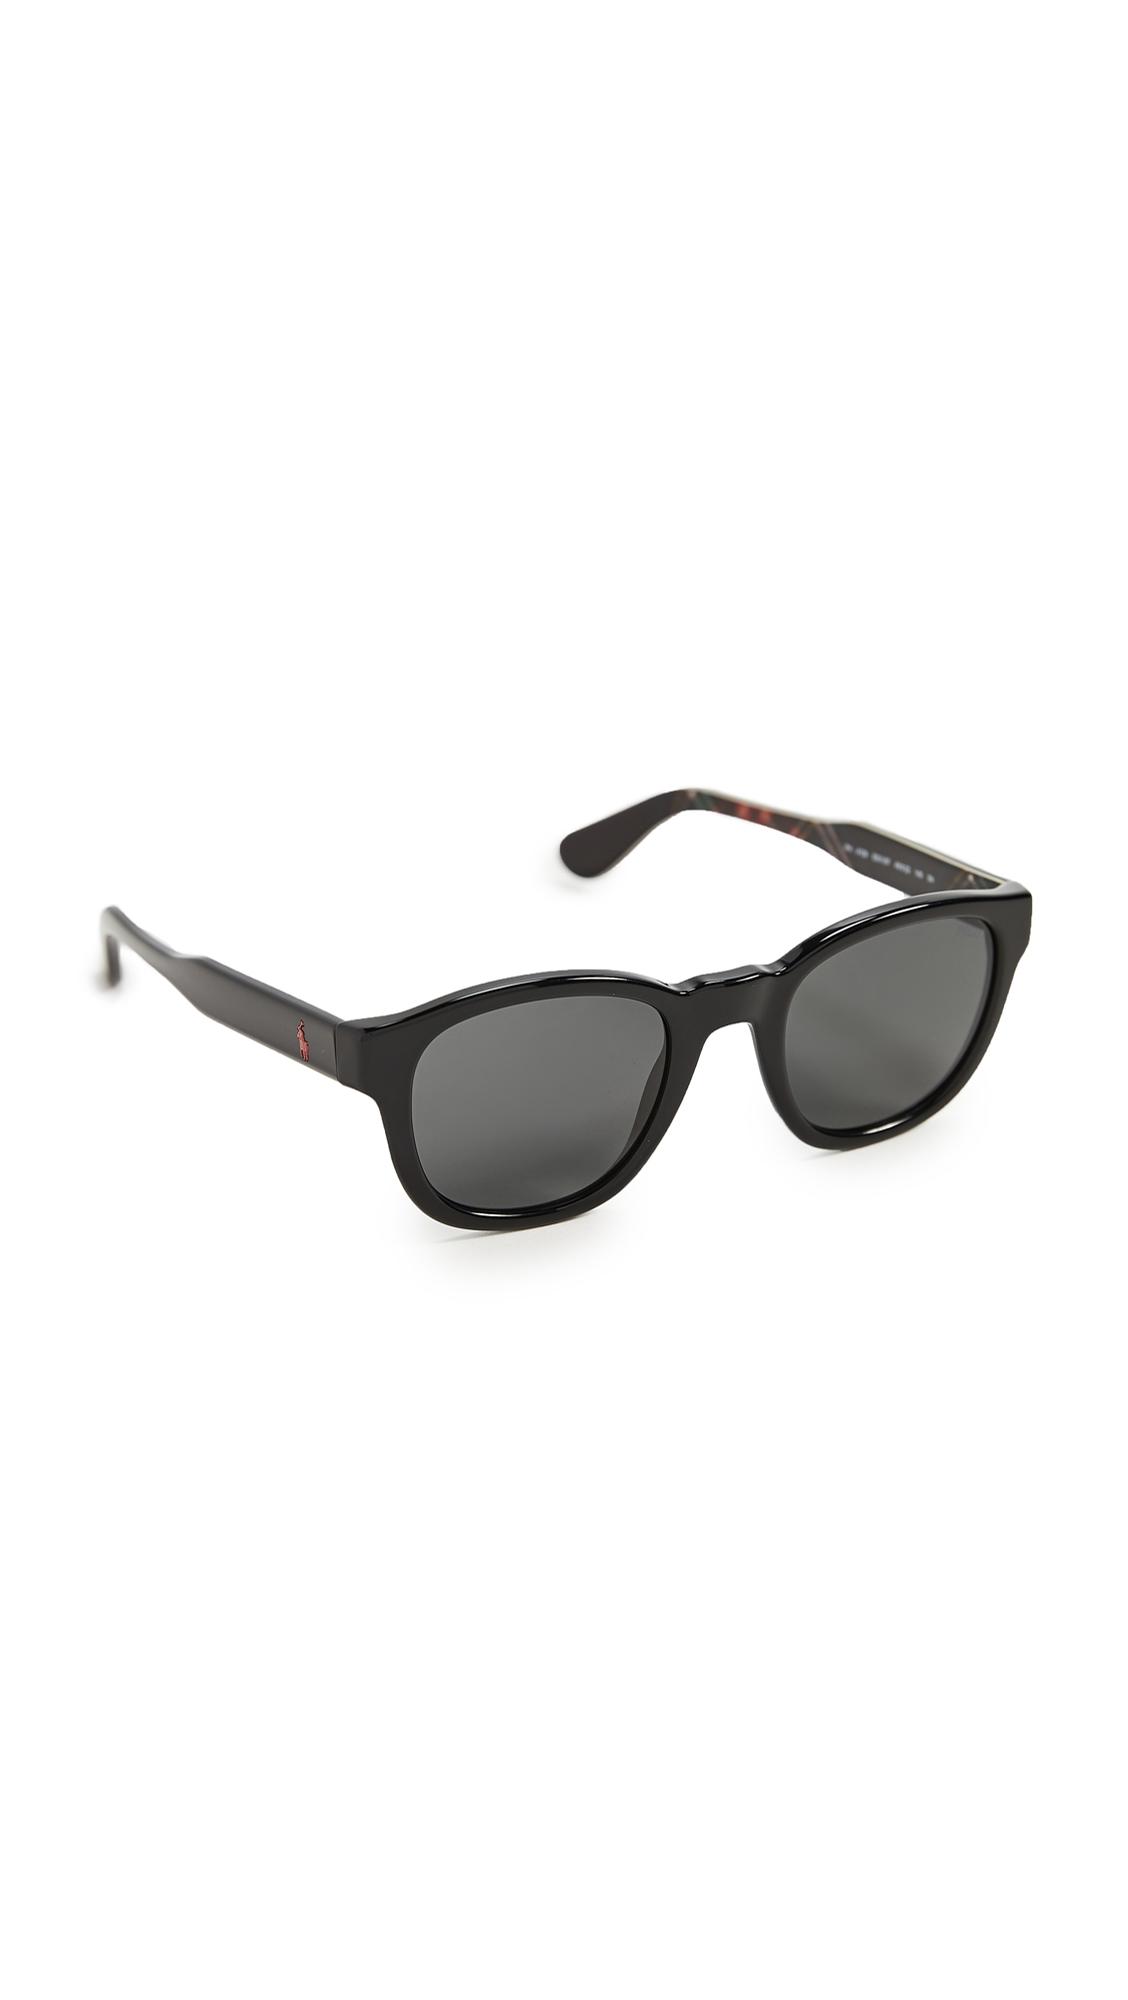 Polo Ralph Lauren 0ph4159-sunglasses In Shiny Black/black